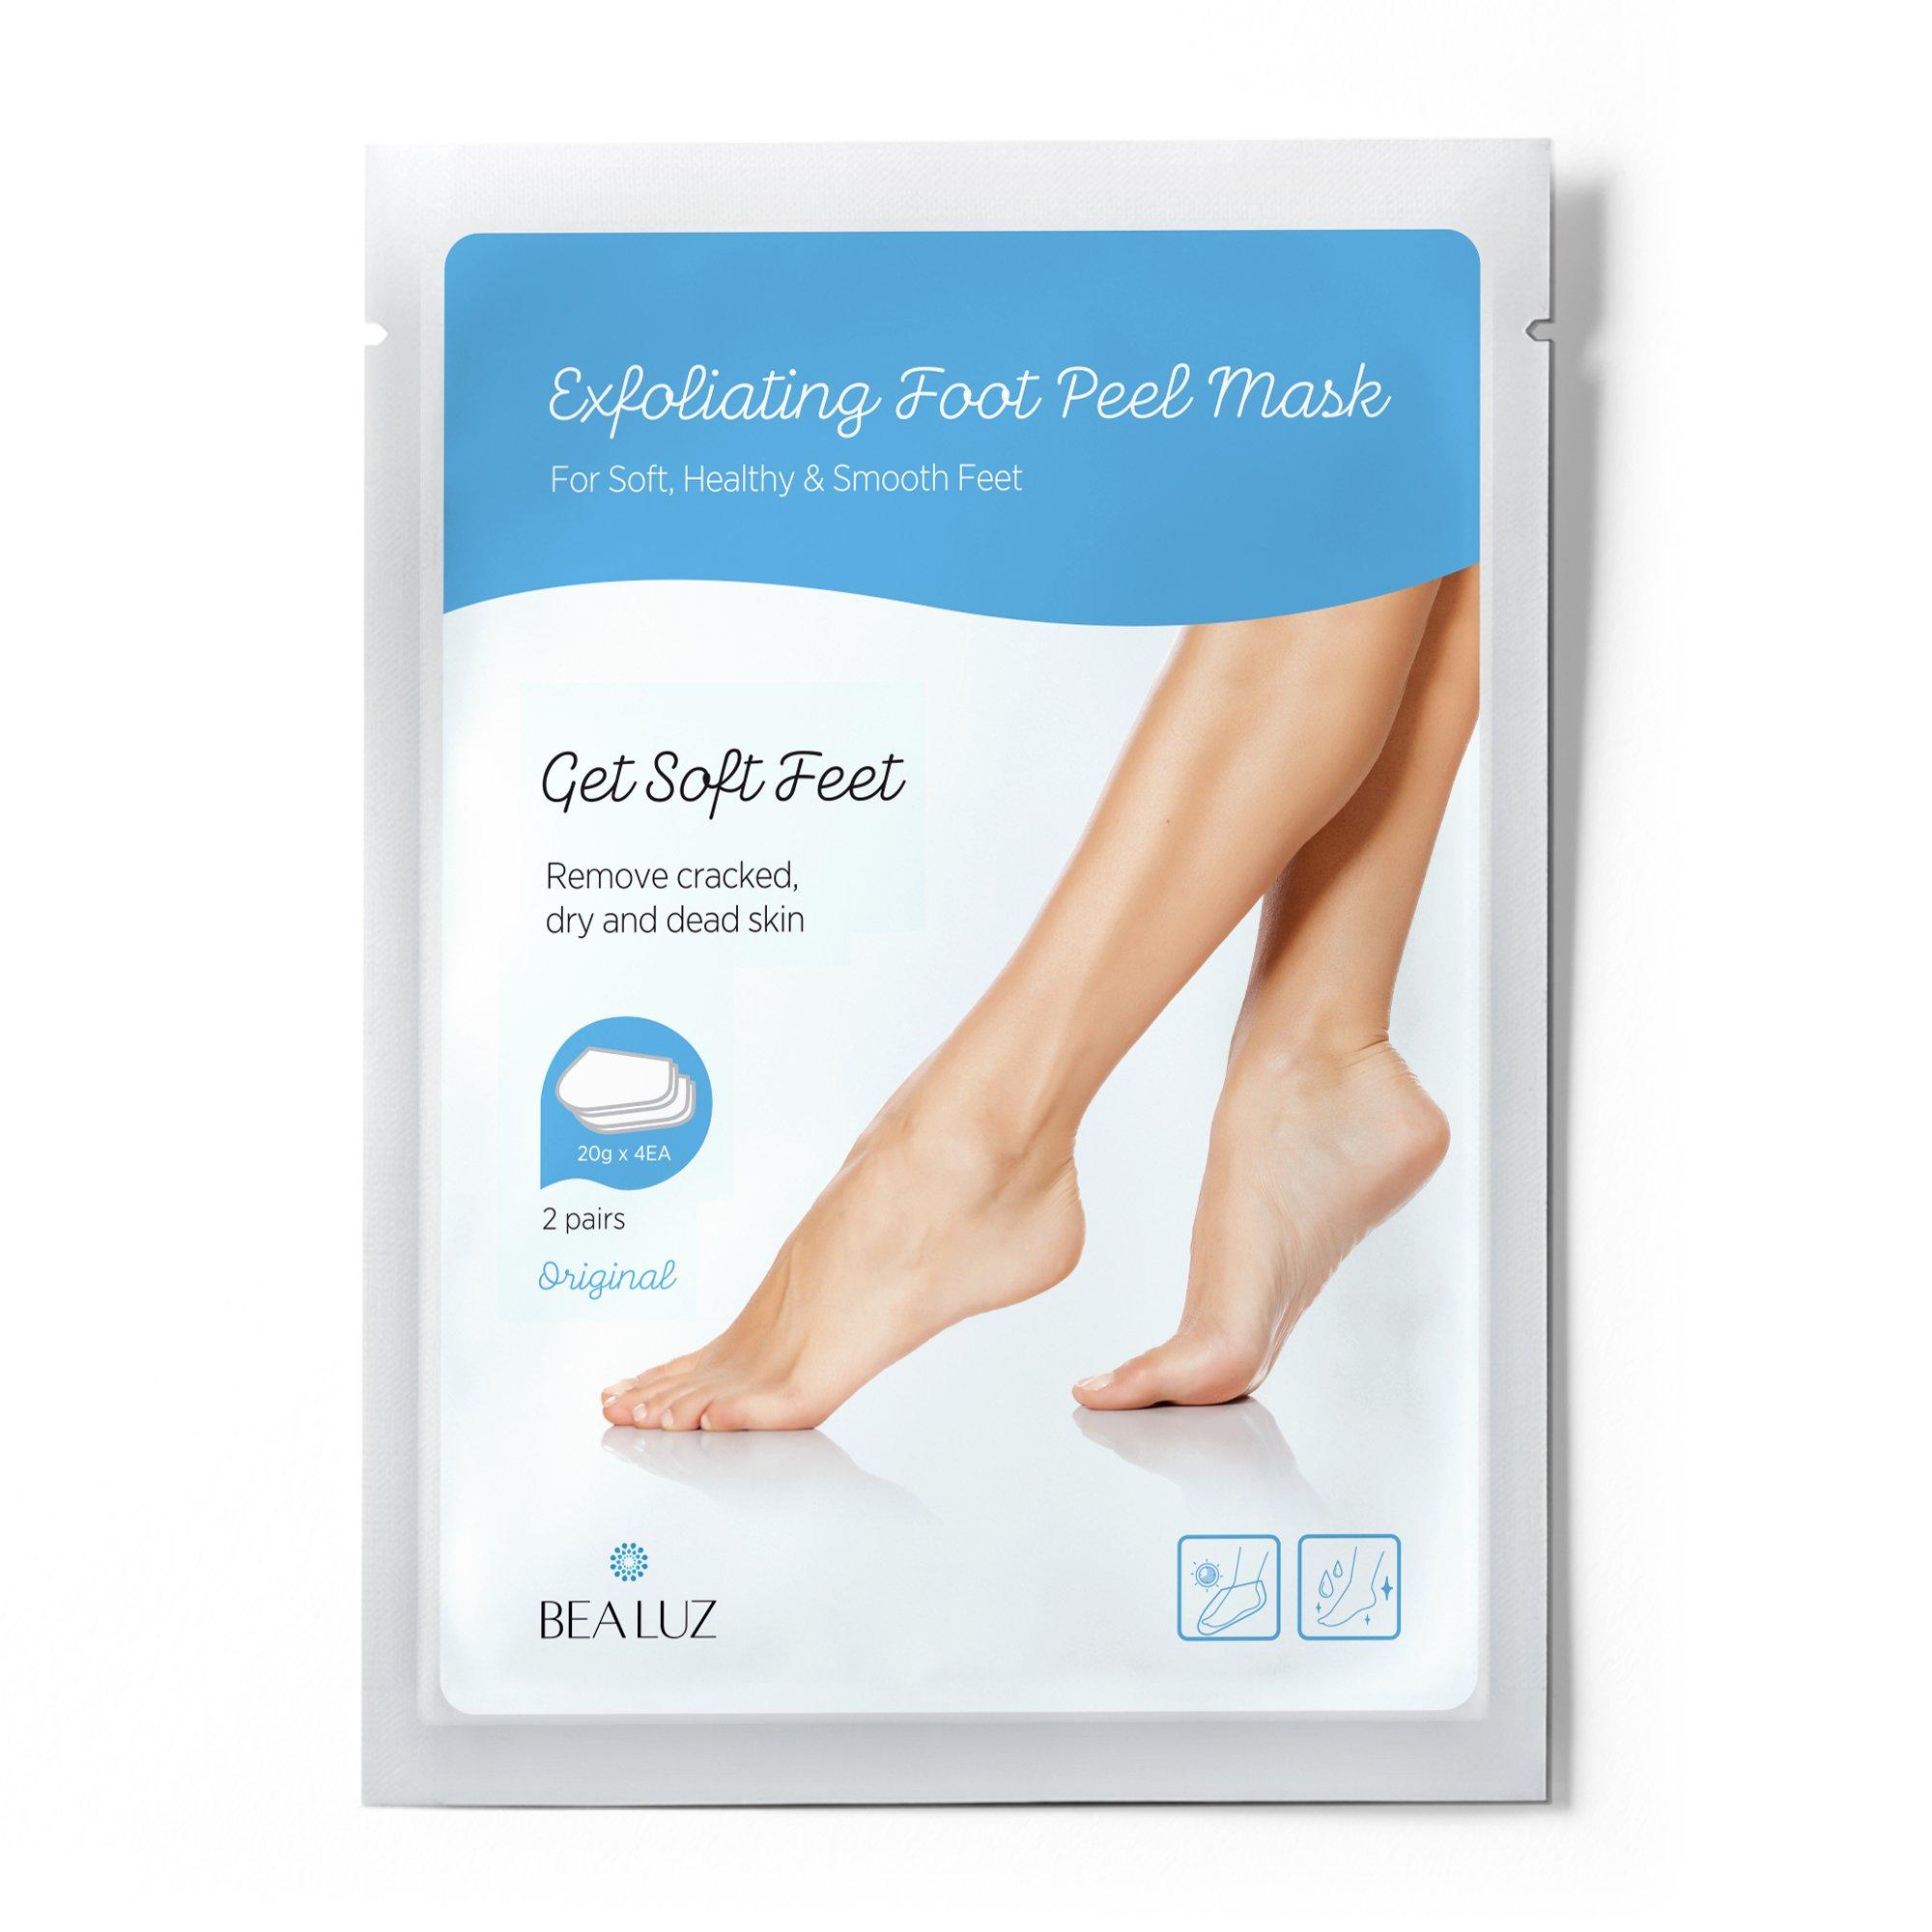 2 Pairs Exfoliating Foot Peel Mask, Soft & Smooth Feet, Peeling Away Rough Dead Skin & Calluses in 1-2 Weeks, Repairing Exfoliant by BEALUZ (Image #2)